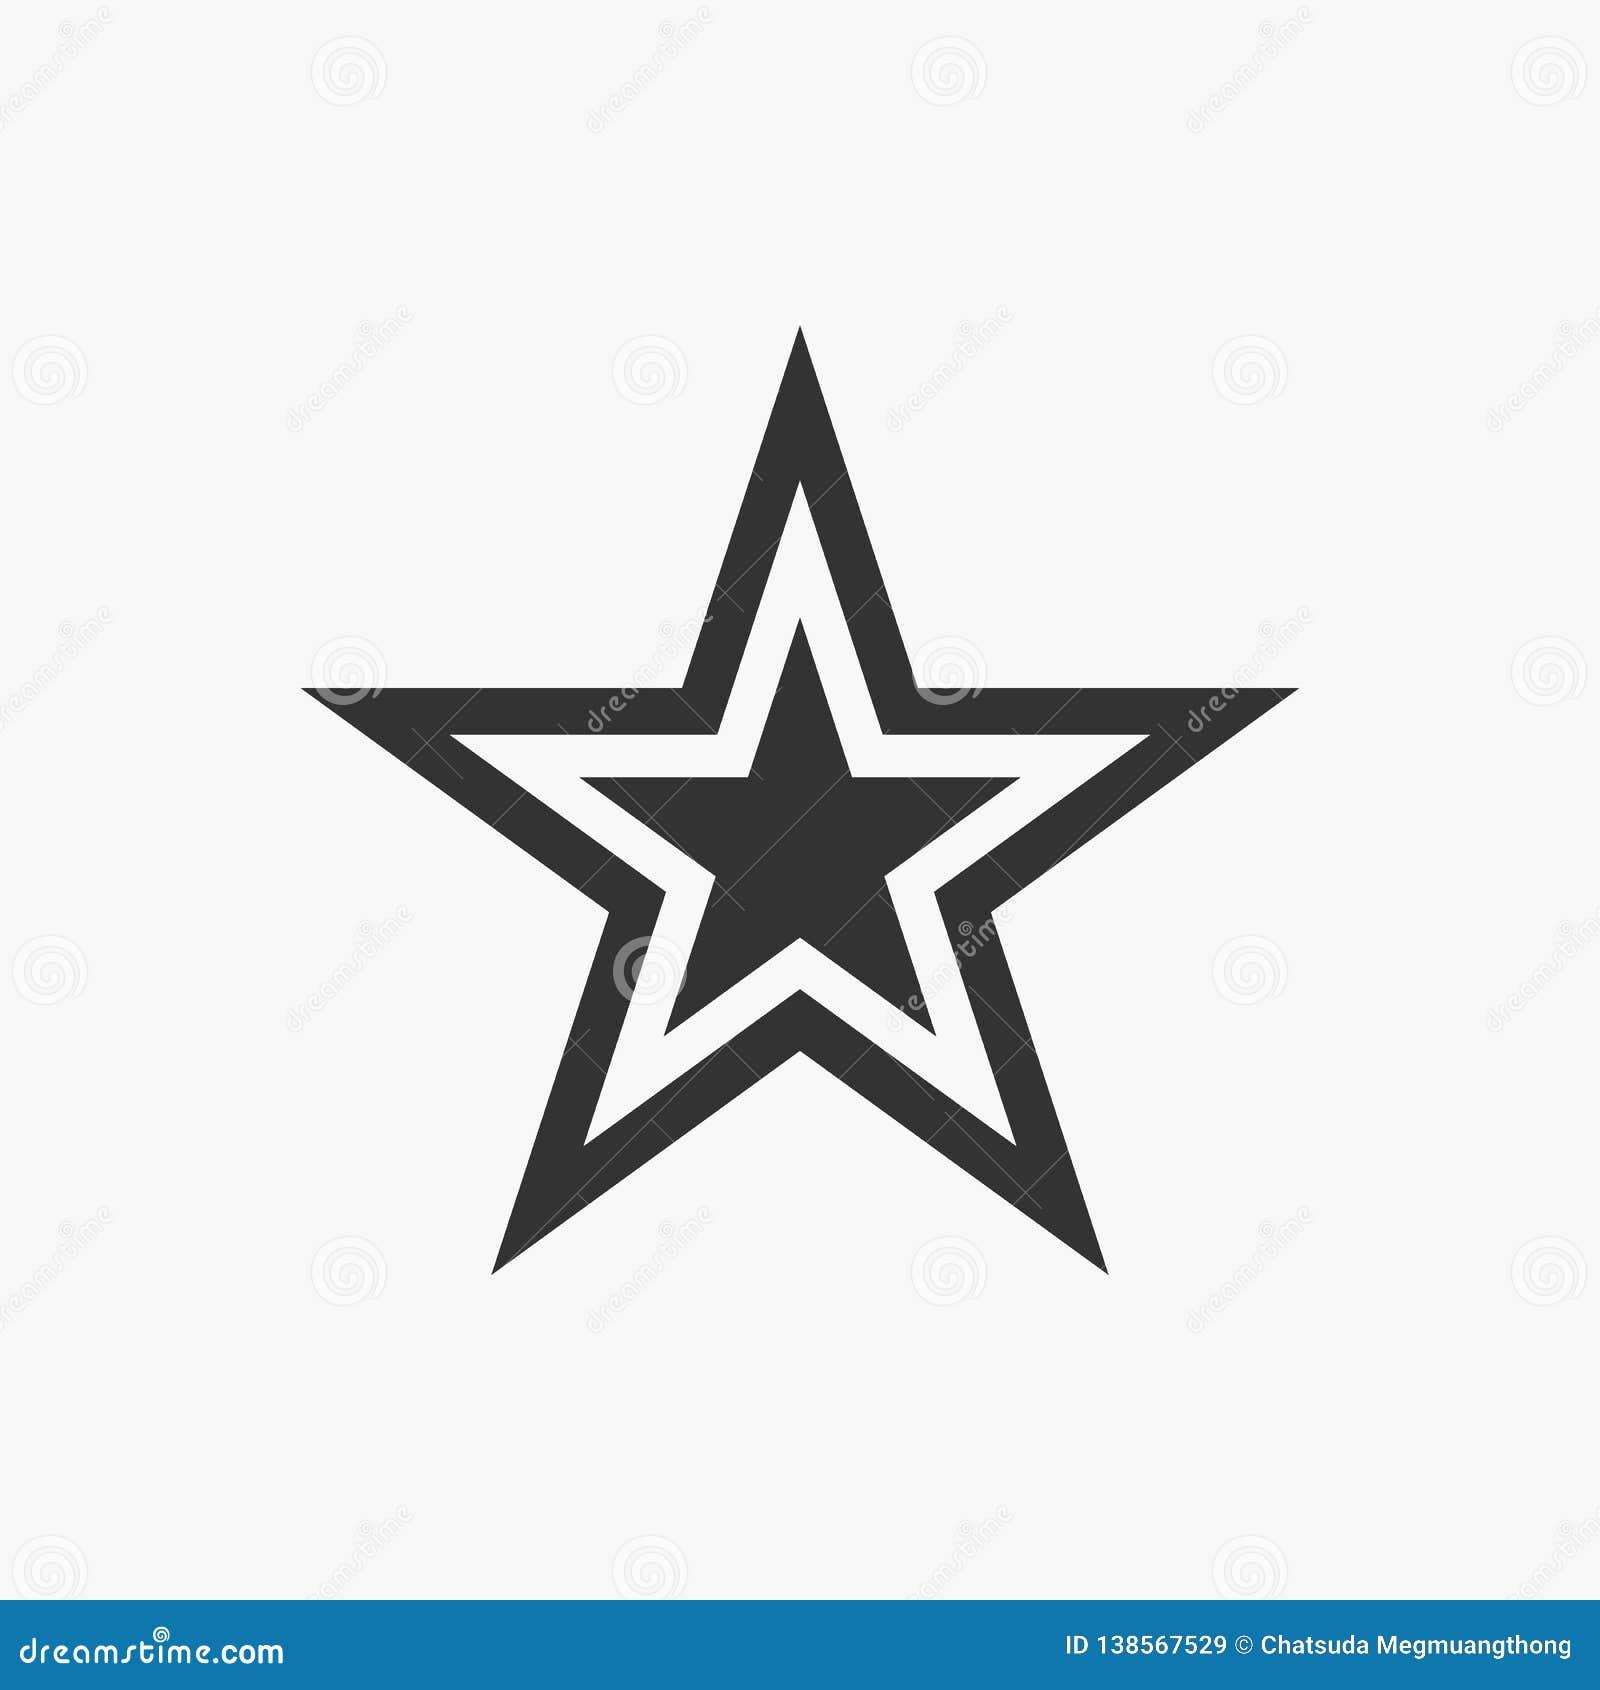 Star icon, sky, night, vote